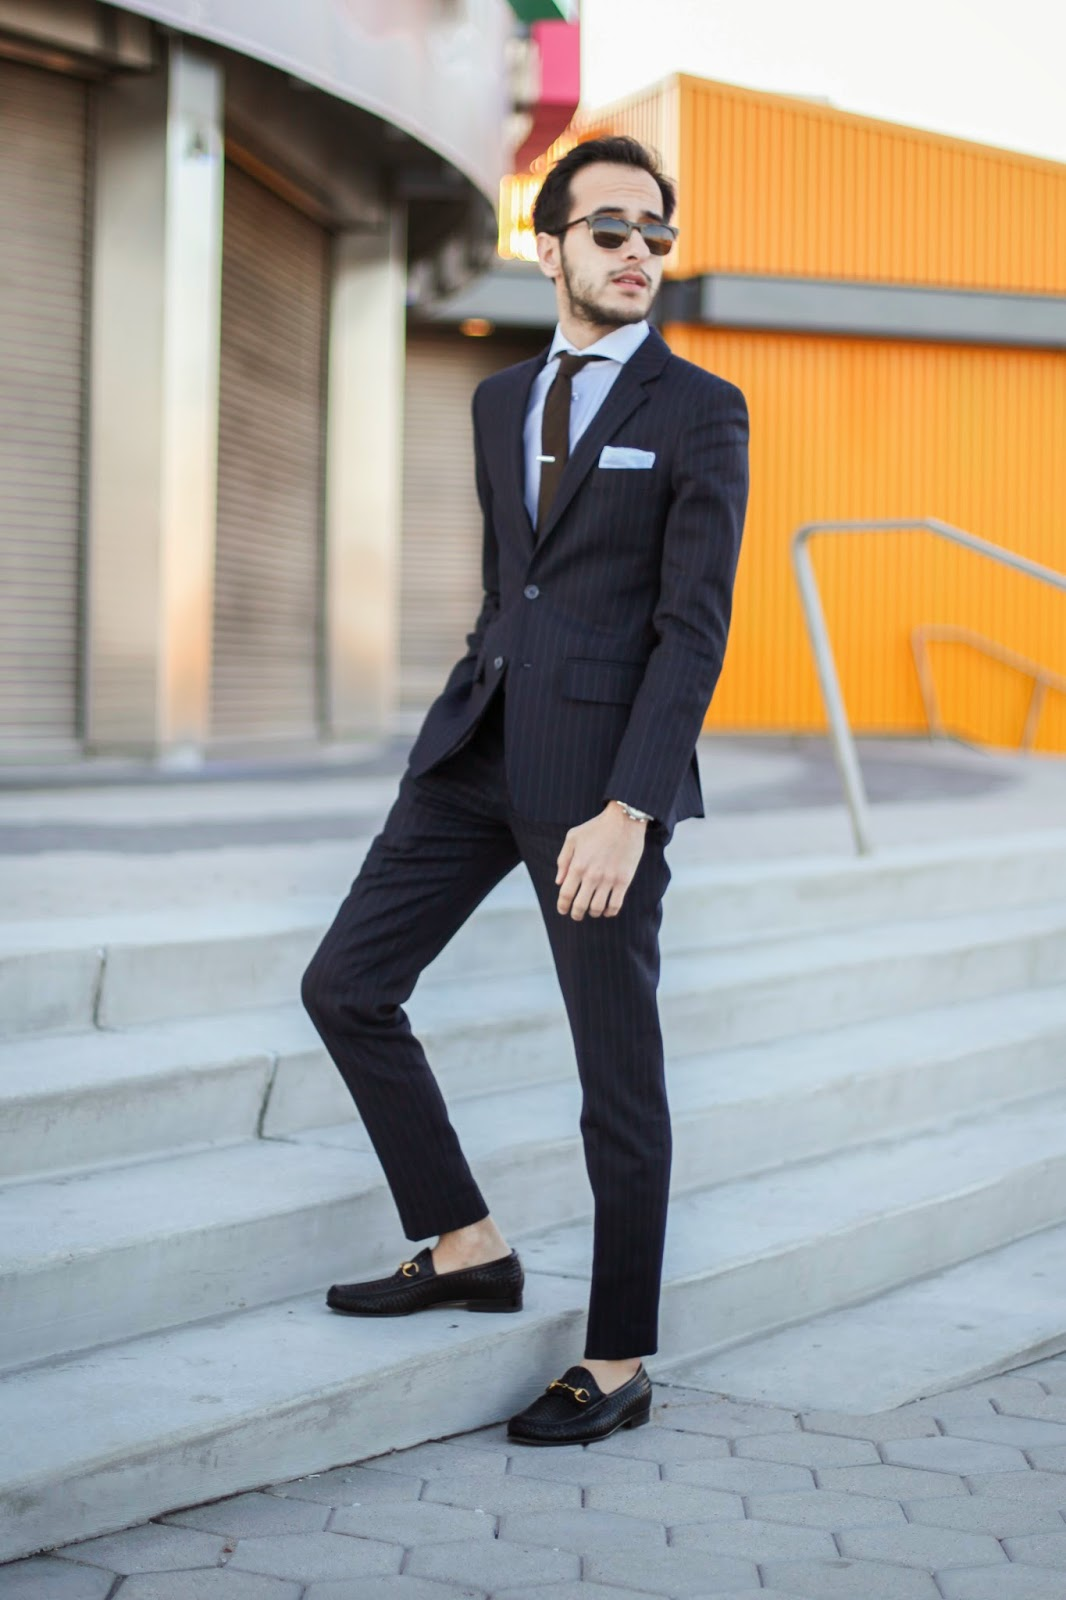 Born To Tailor Bespoke Custom Tailor Suits New York Varun Gandhi 2.JPG